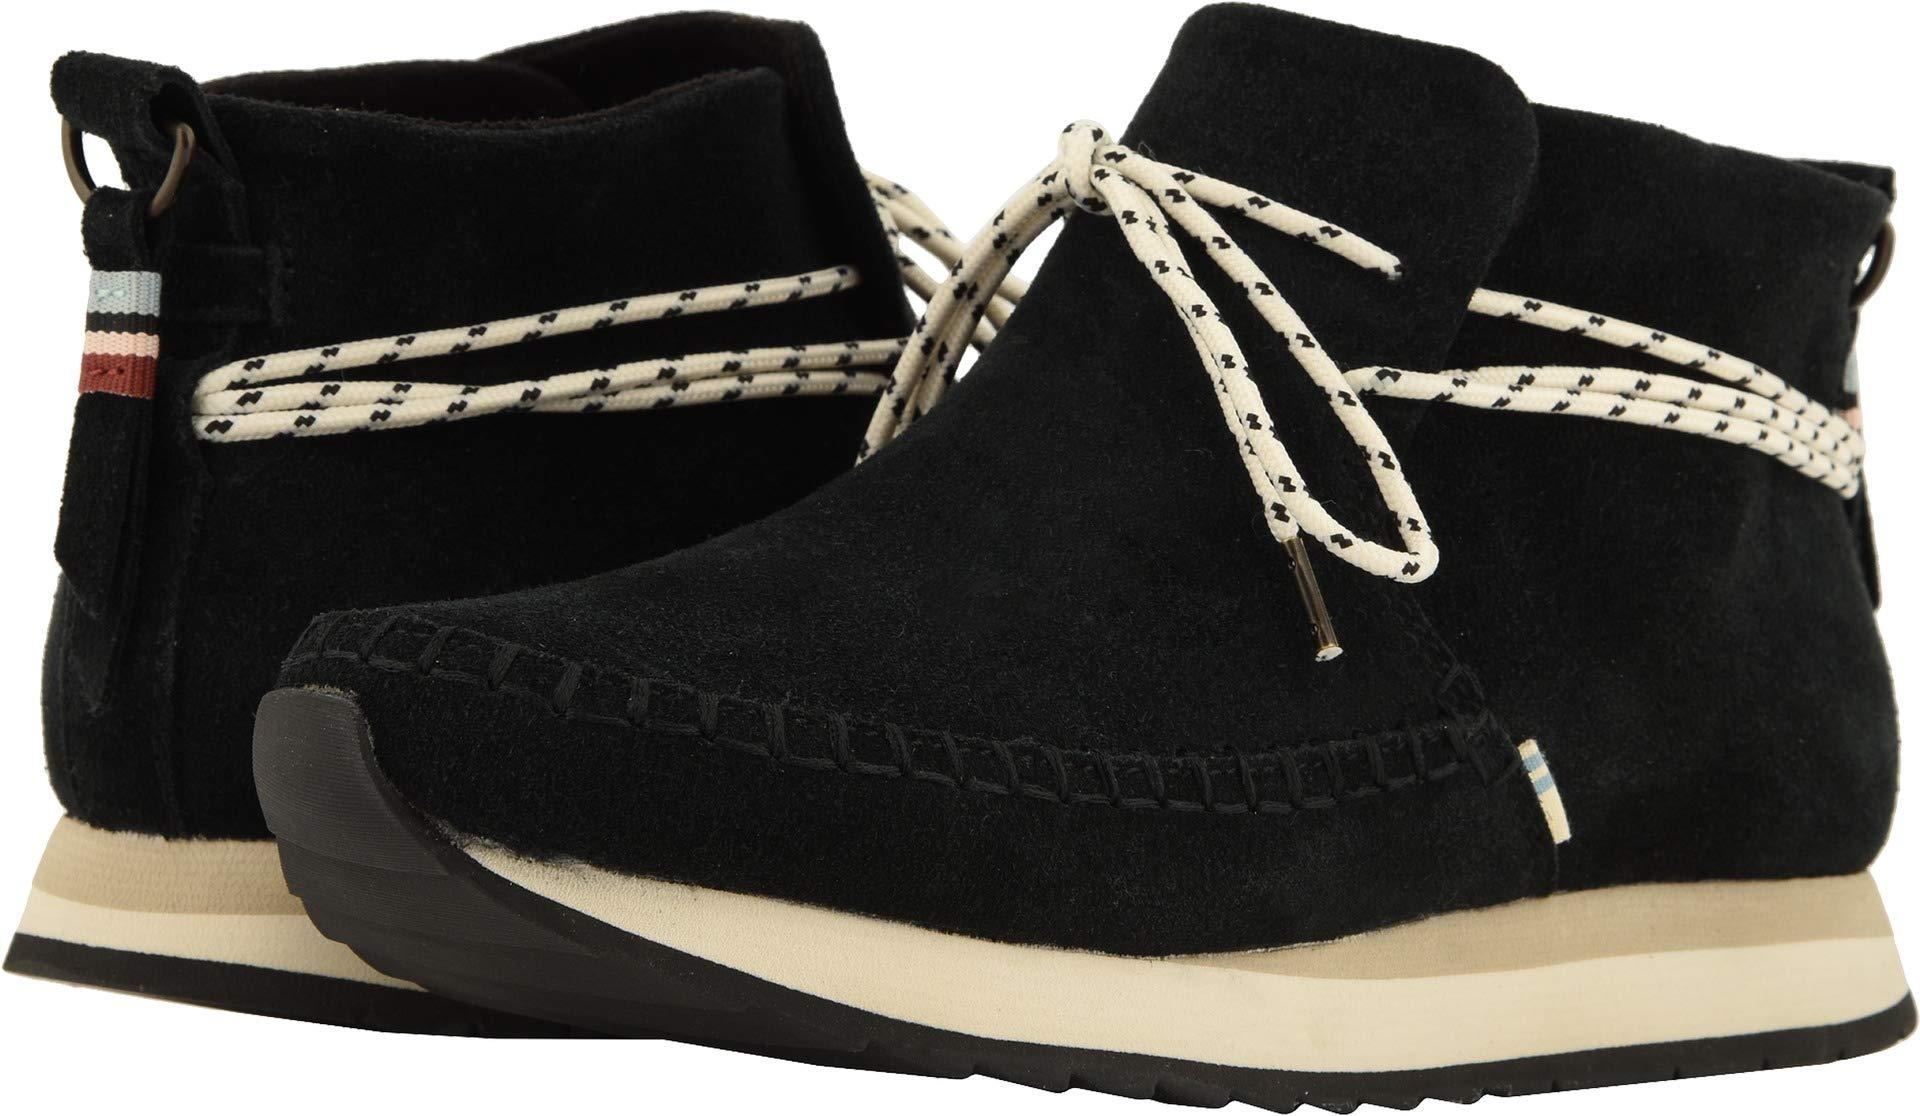 TOMS Women's Rio Suede Sneaker, Size: 7.5 B(M) US, Color Black Suede WR